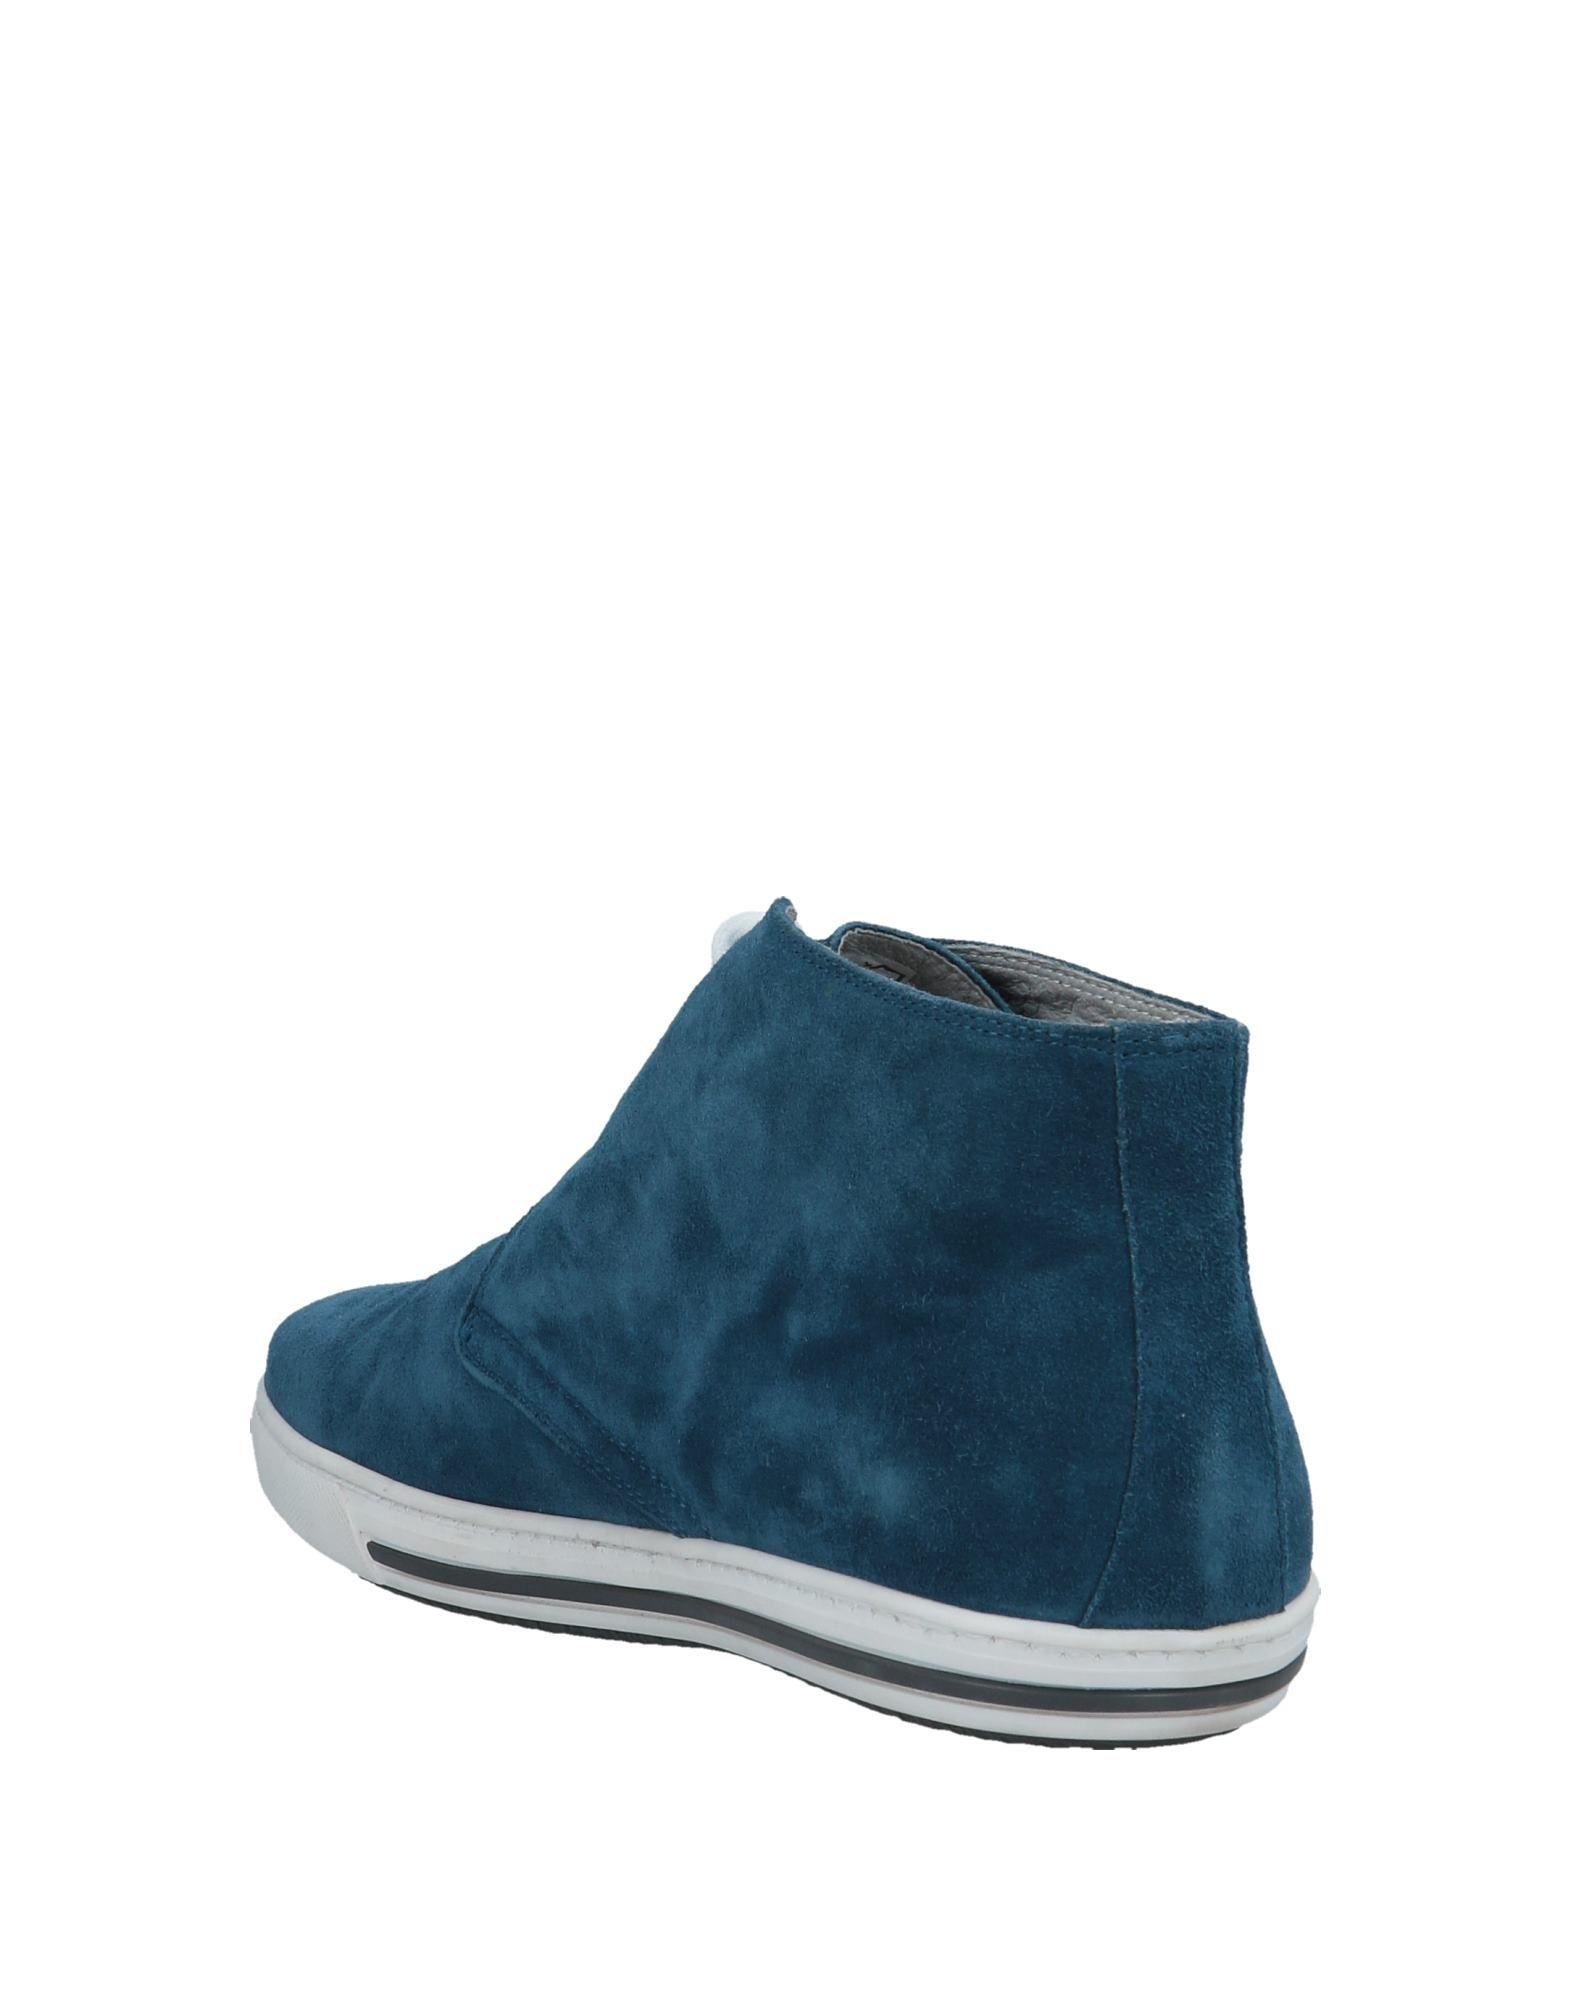 Rabatt echte Herren Schuhe Enrico Fantini Sneakers Herren echte  11554420EK a29572